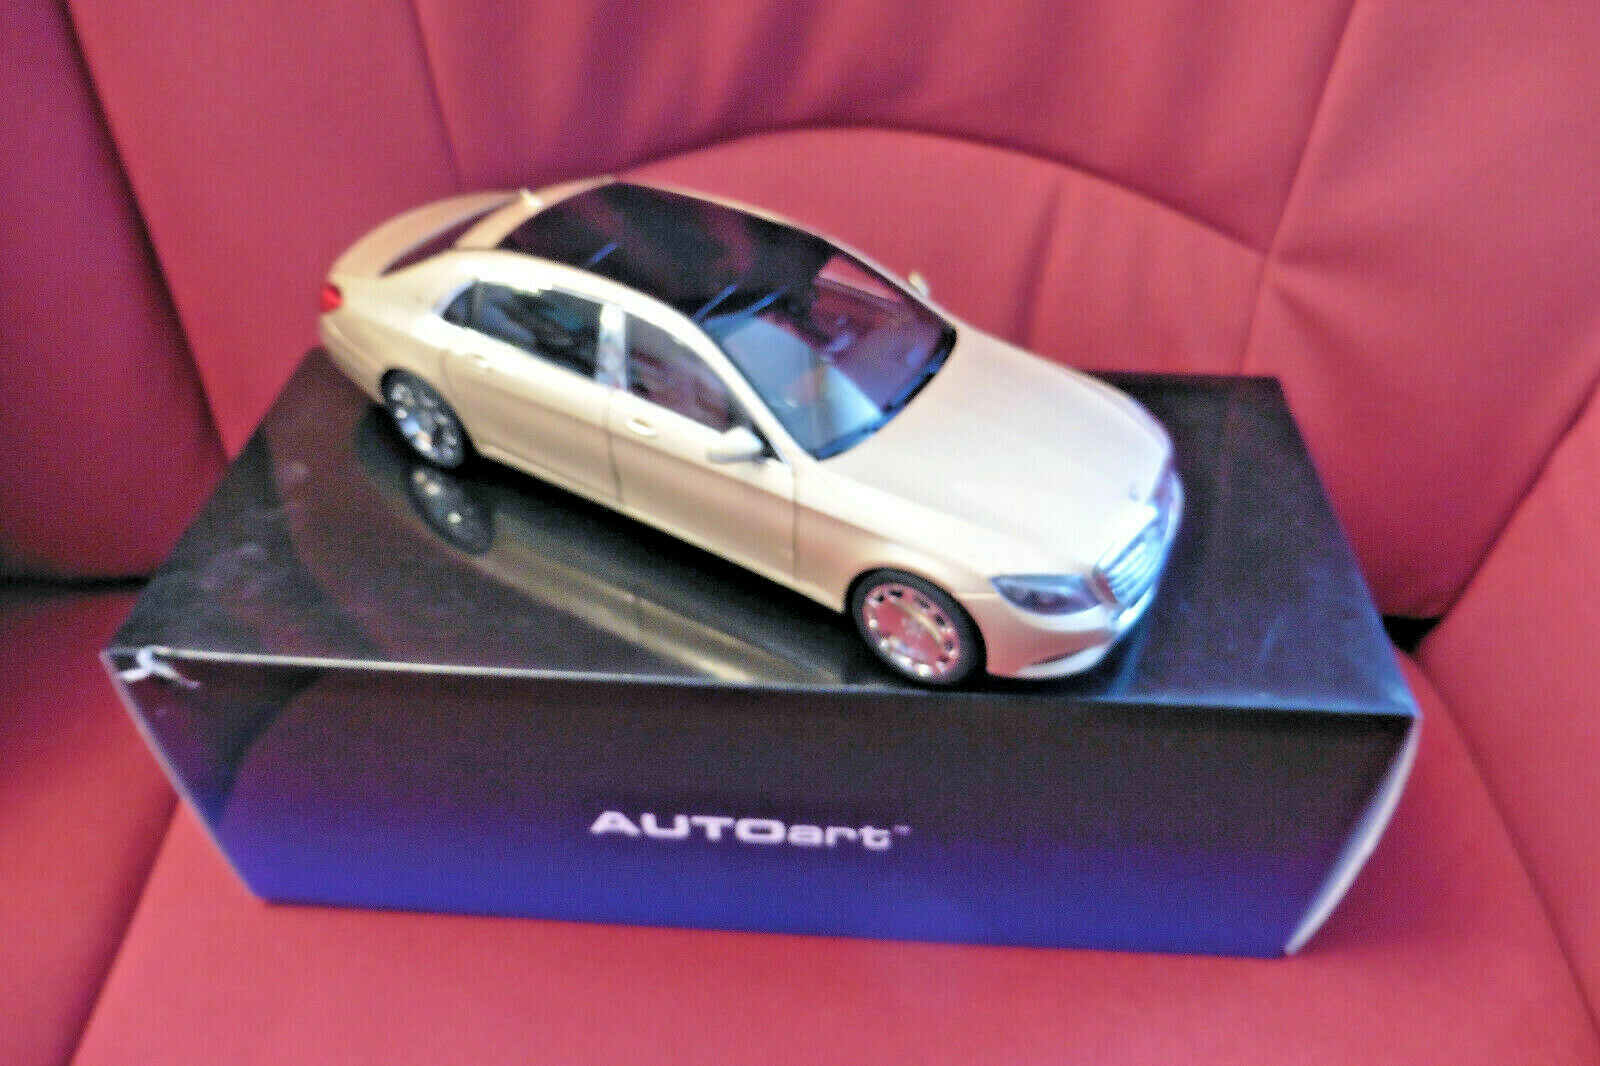 AUTOART 76294 Mercedes-Maybach S-Klasse S600, LIGHT or, 1 18, mint & boxed